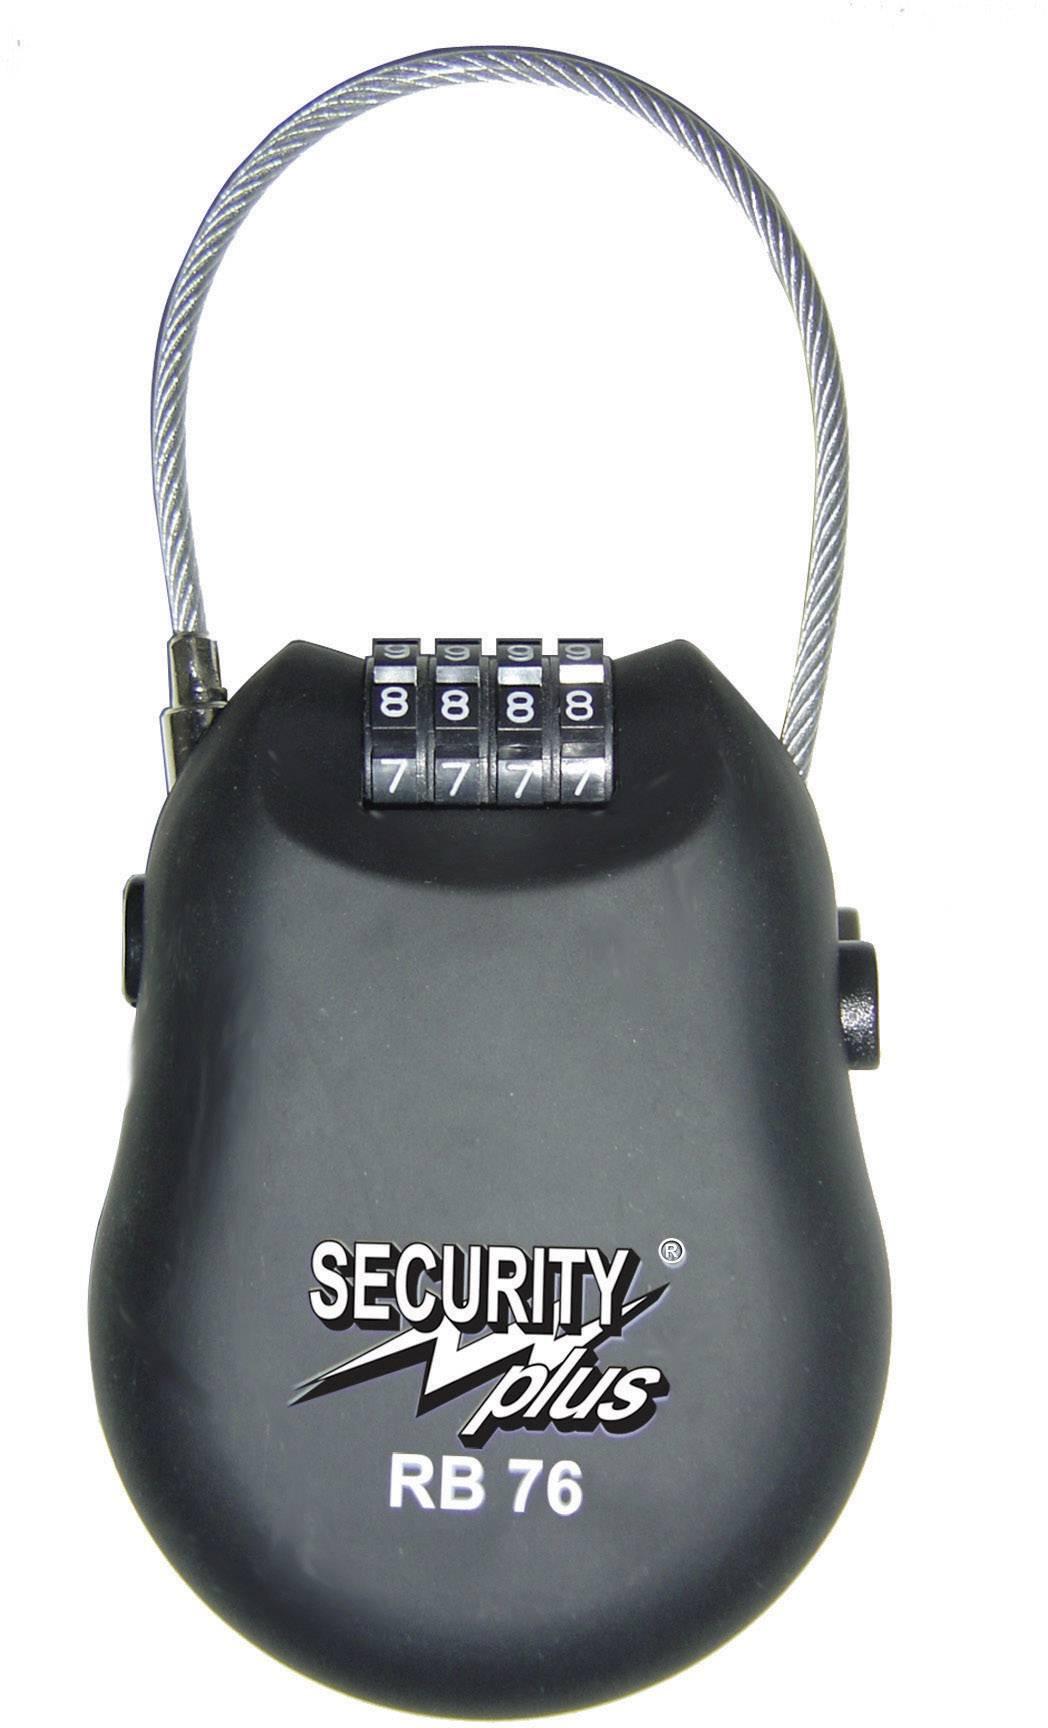 Kabelový zámek Security Plus 0076, (Ø x d) 3 mm x 1000 mm, černá